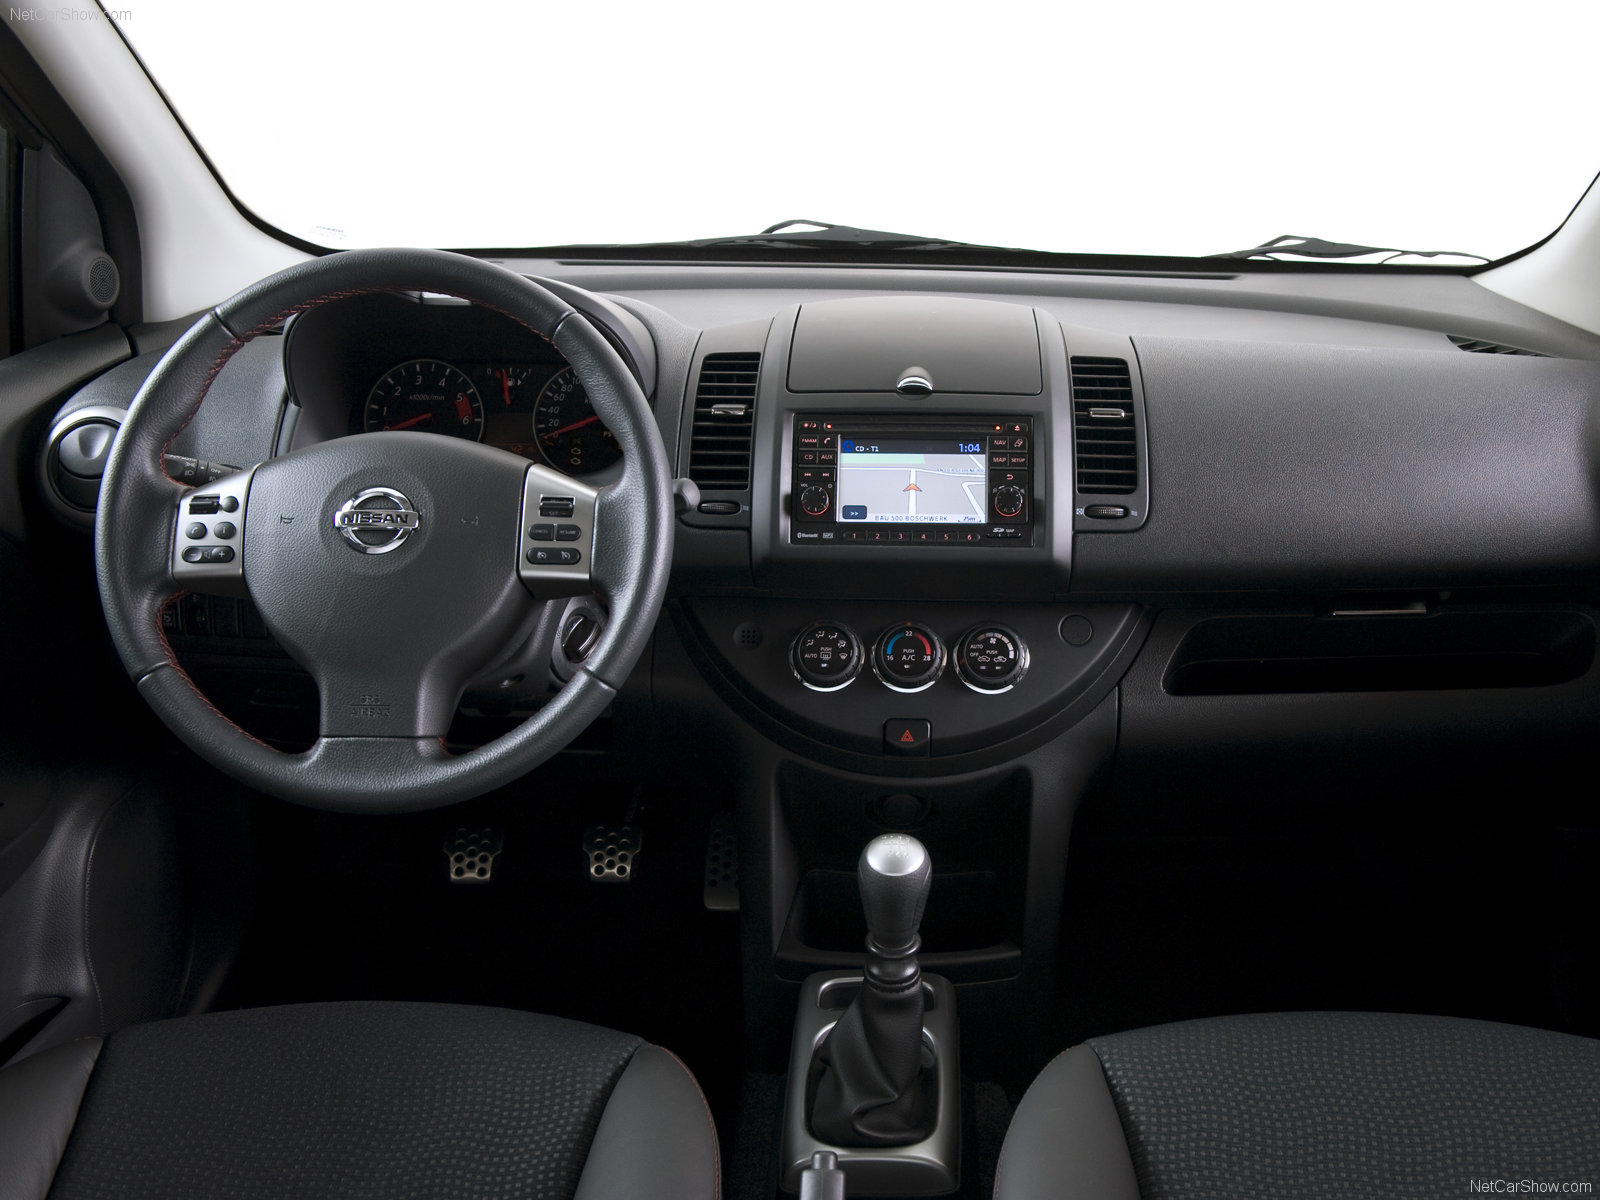 Volkswagen Passat 2003 Diagram Fuse Box Arrangement Likewise Oil